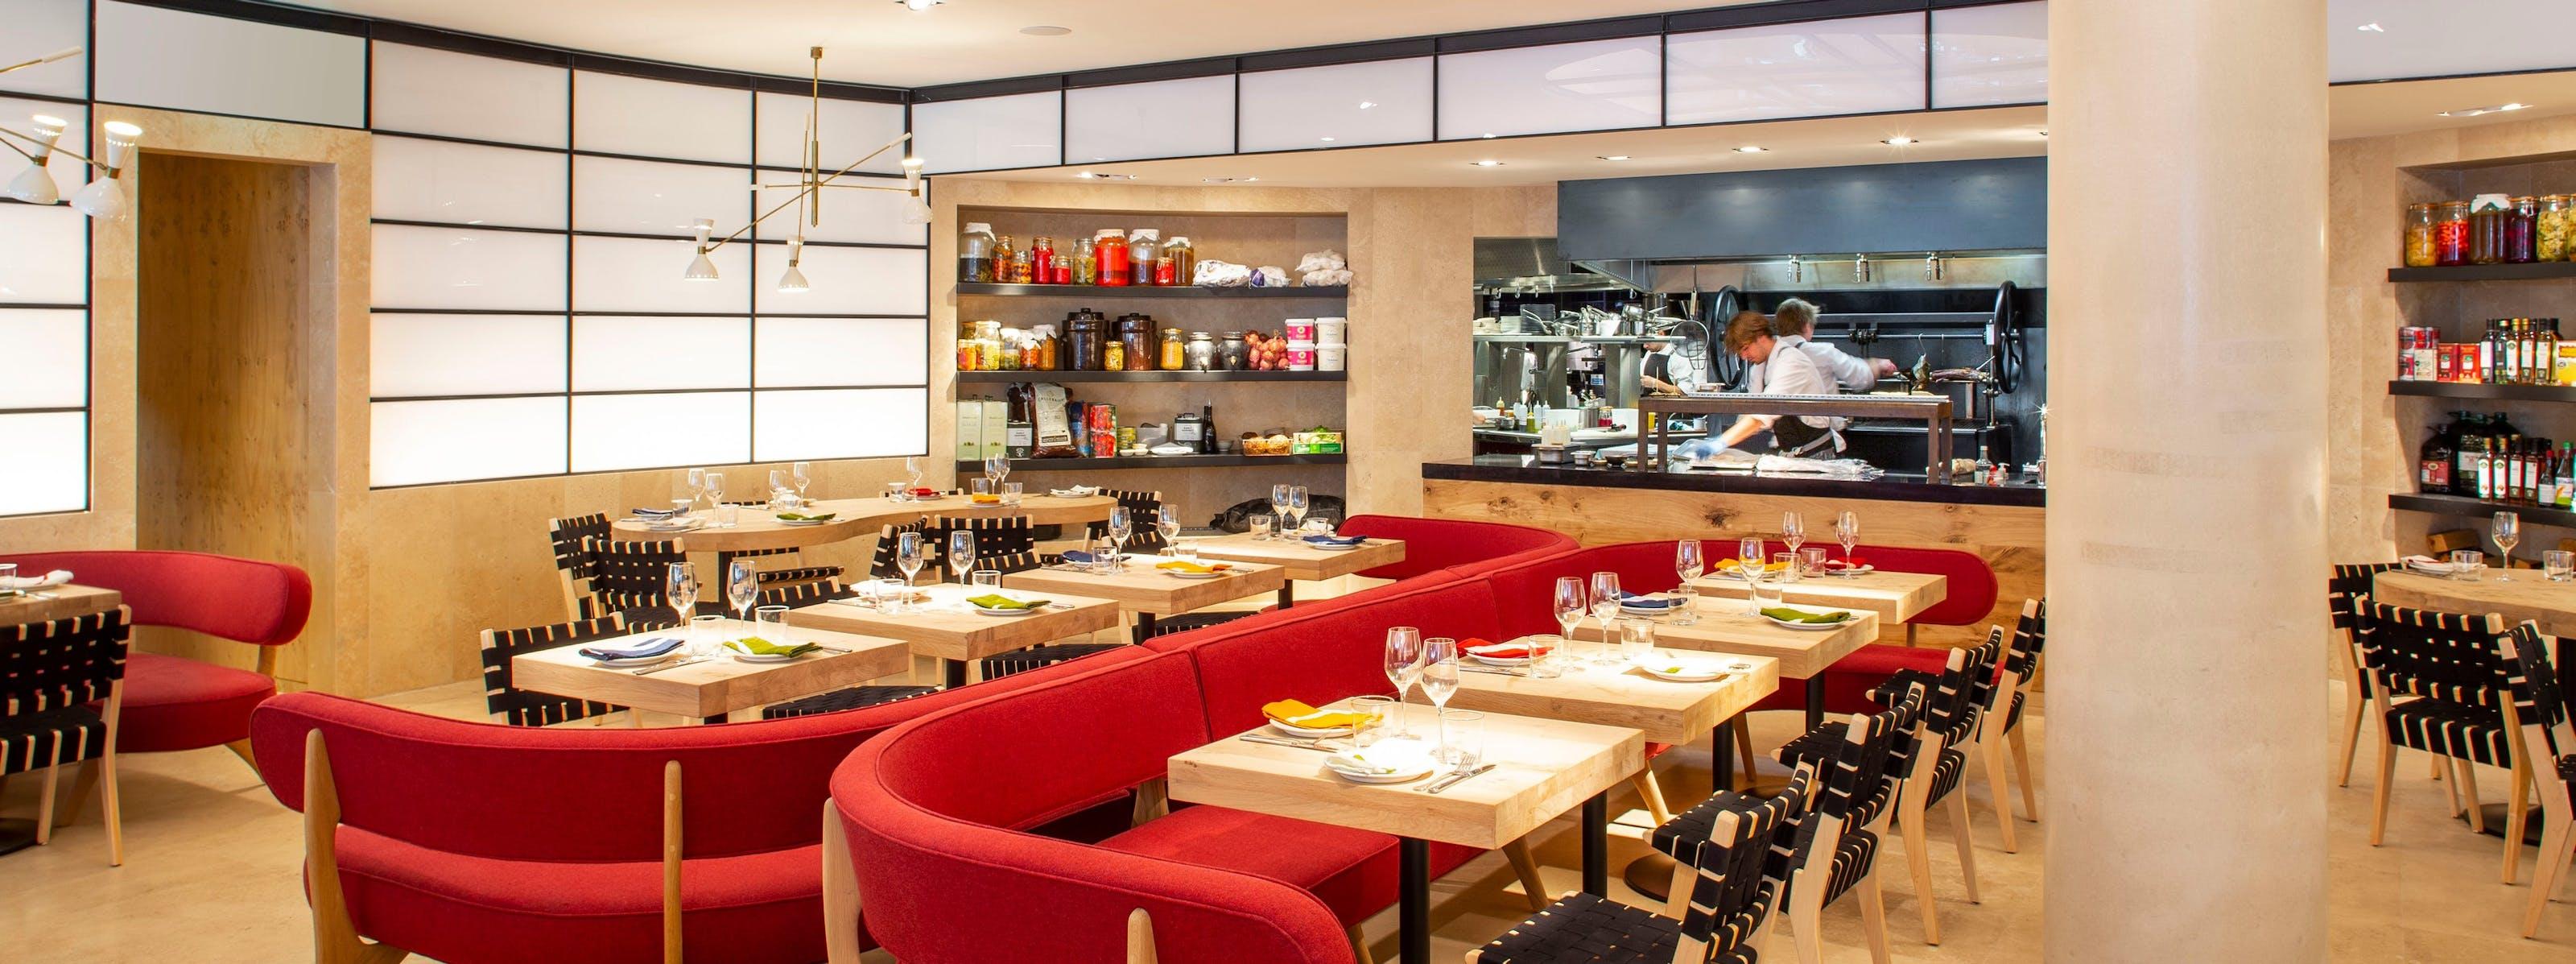 10 Restaurants For An Anniversary Dinner London The Infatuation